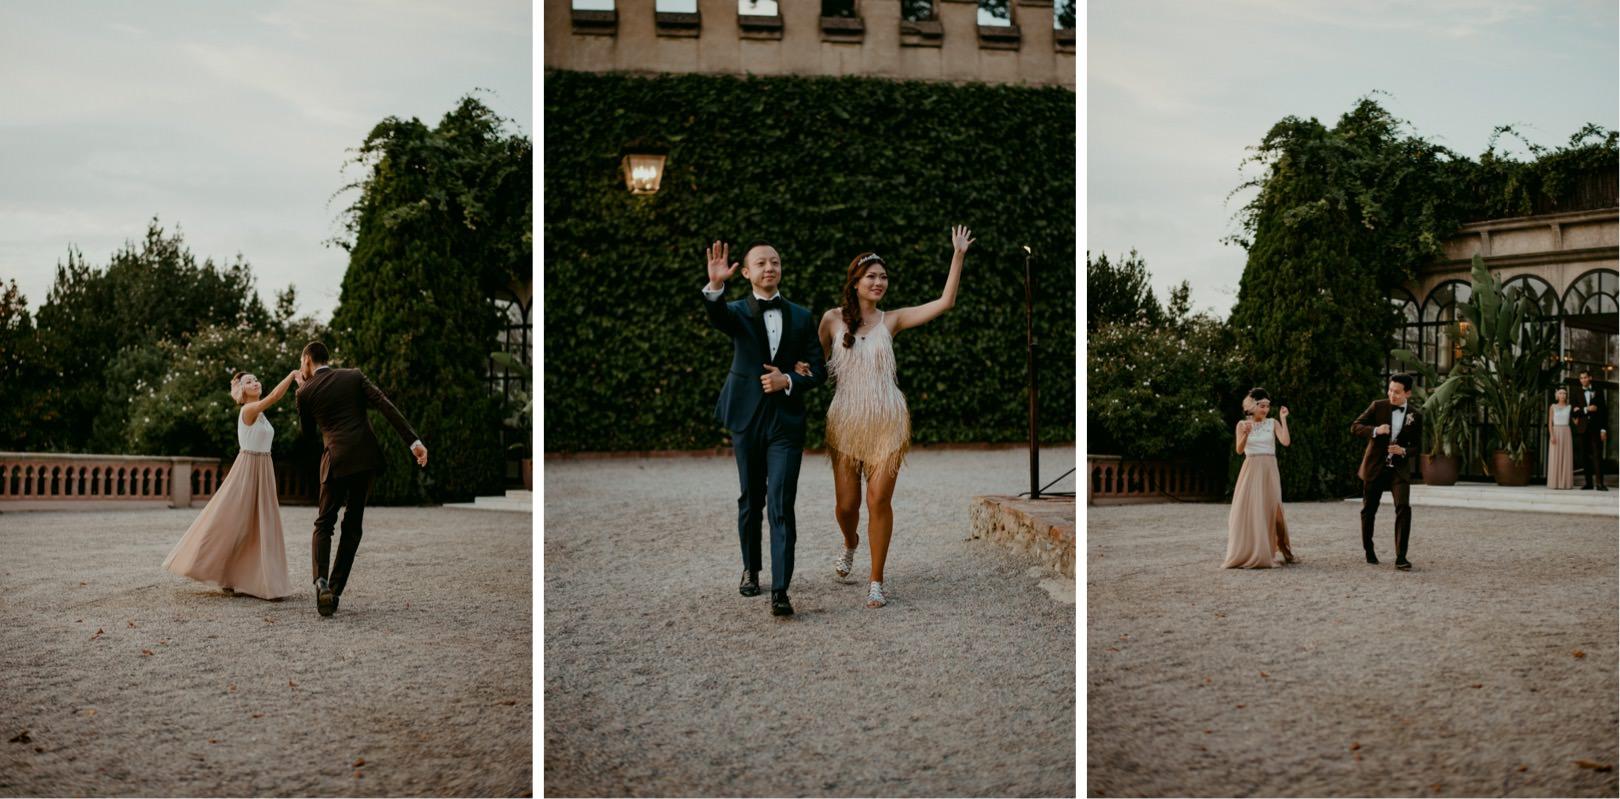 Candid wedding photos at Castell de Sant Marcal